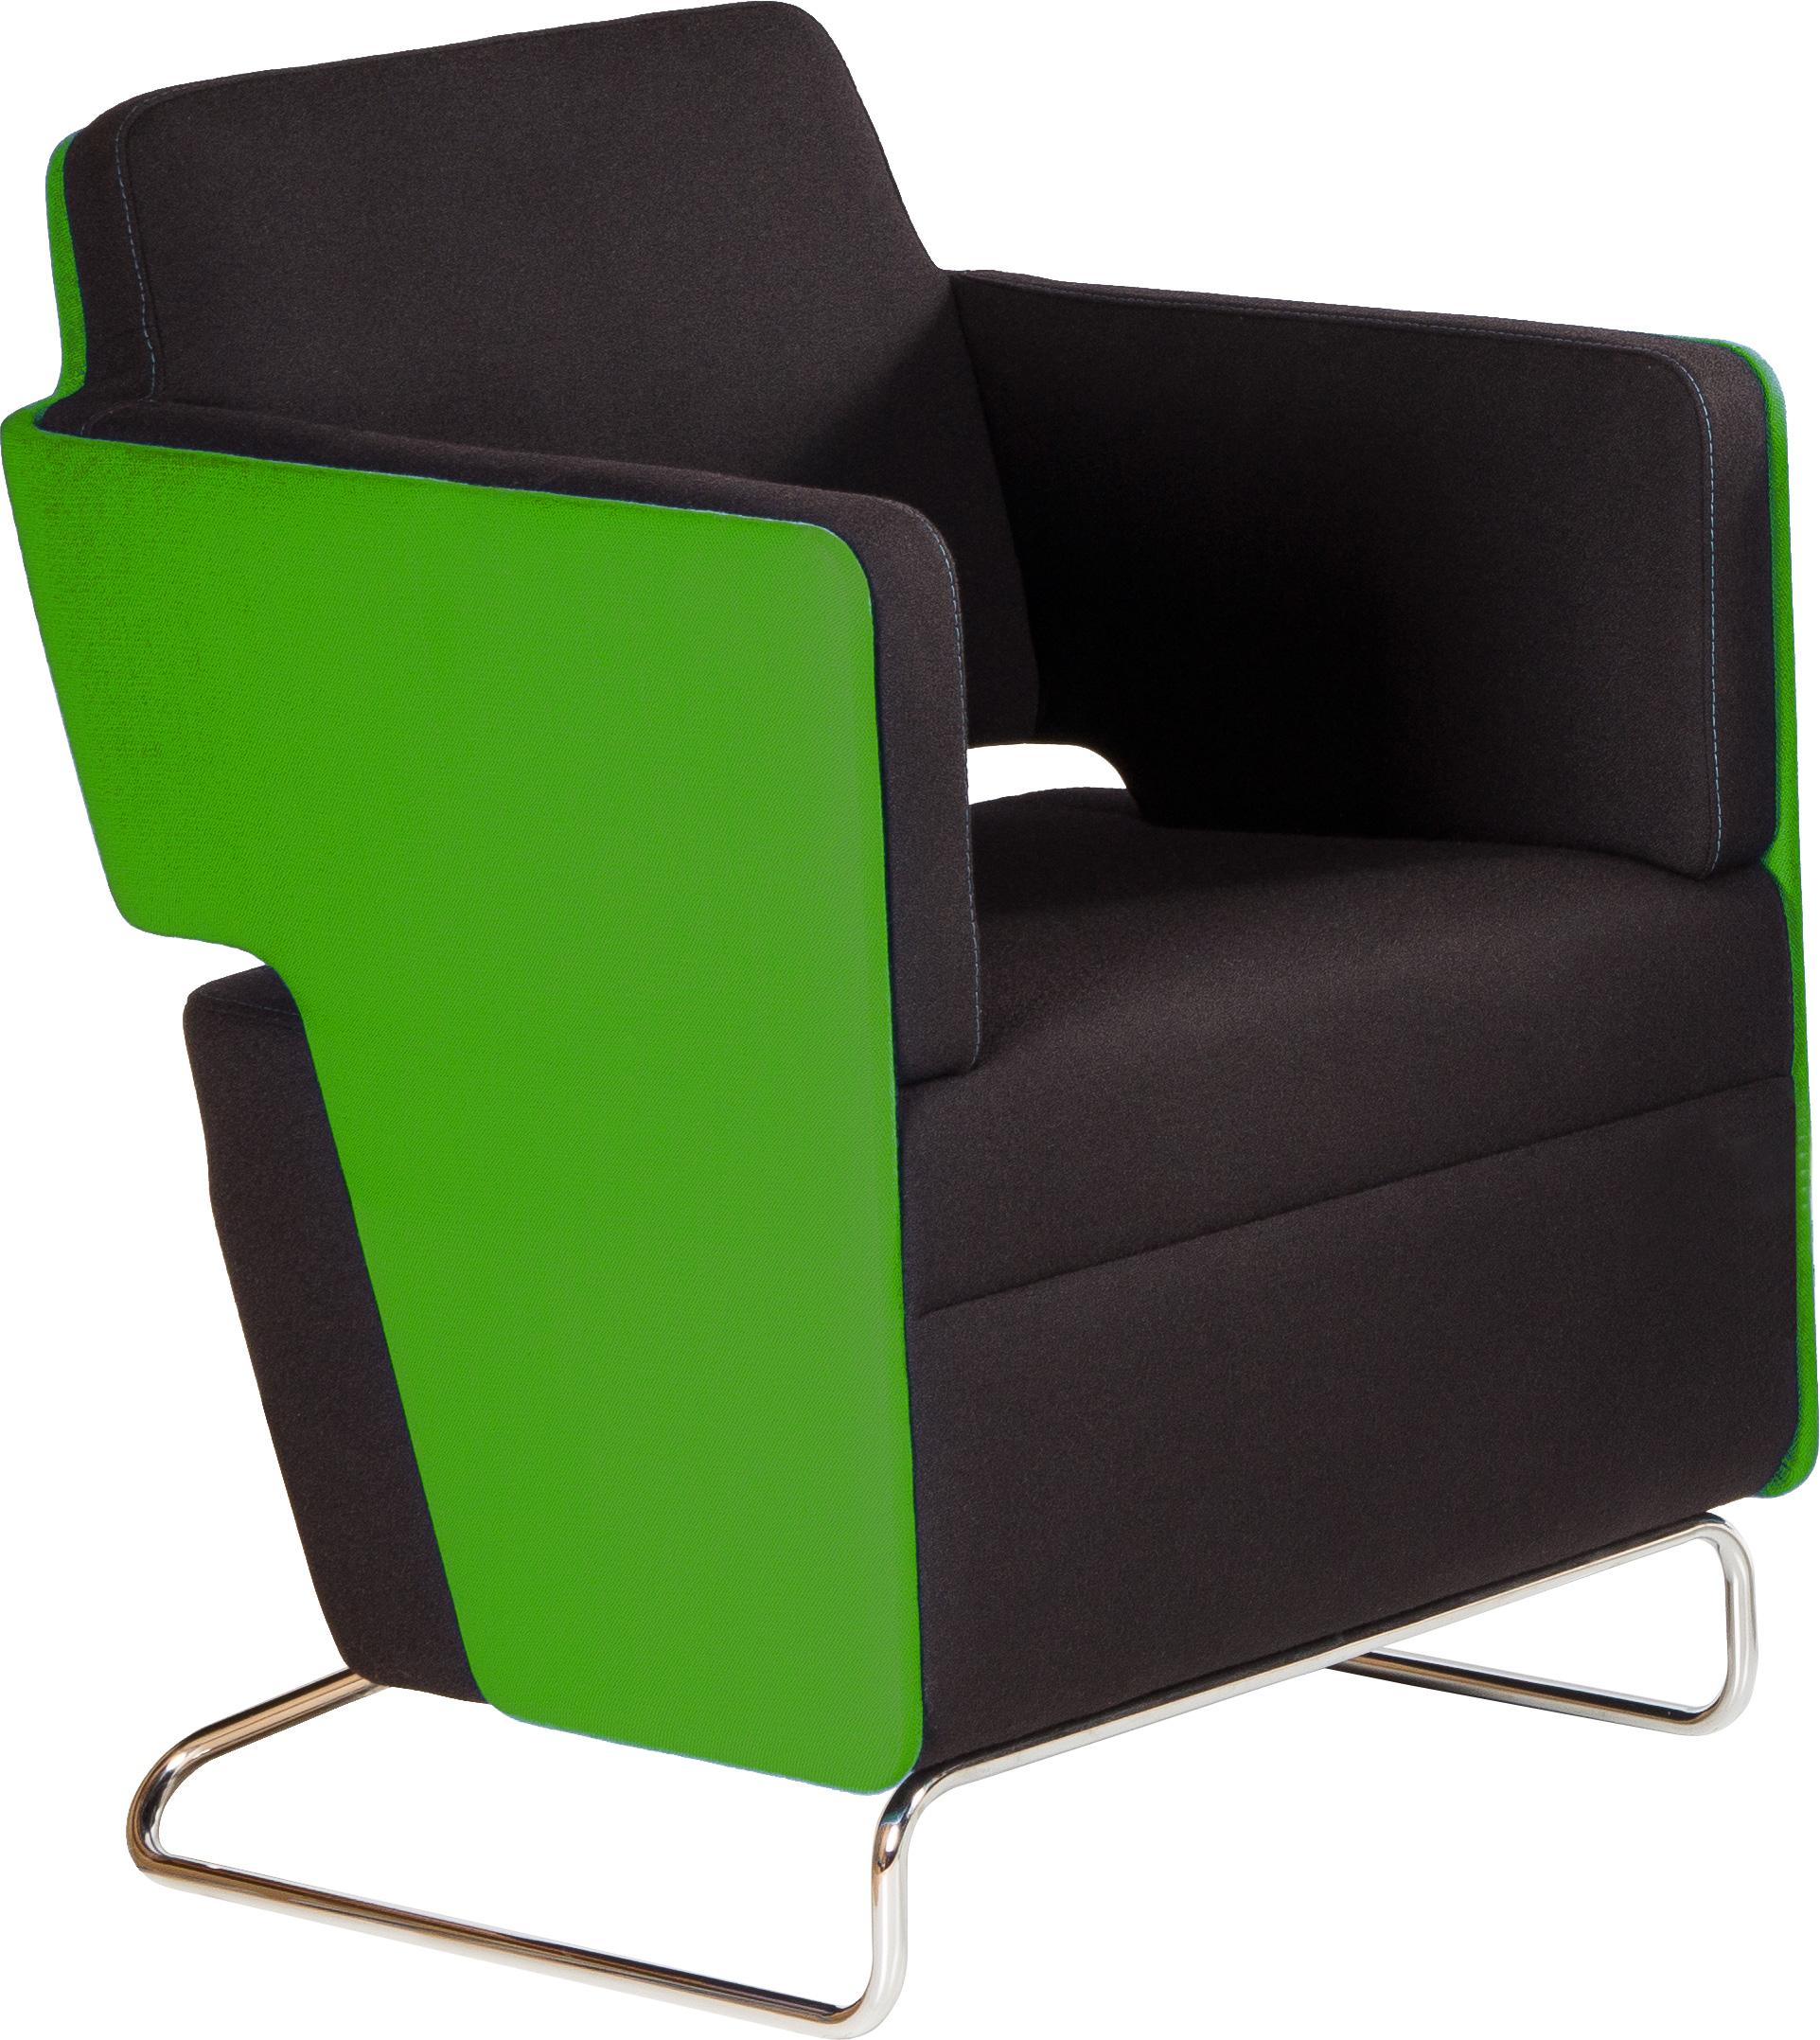 reception-seating-IMAGE 68